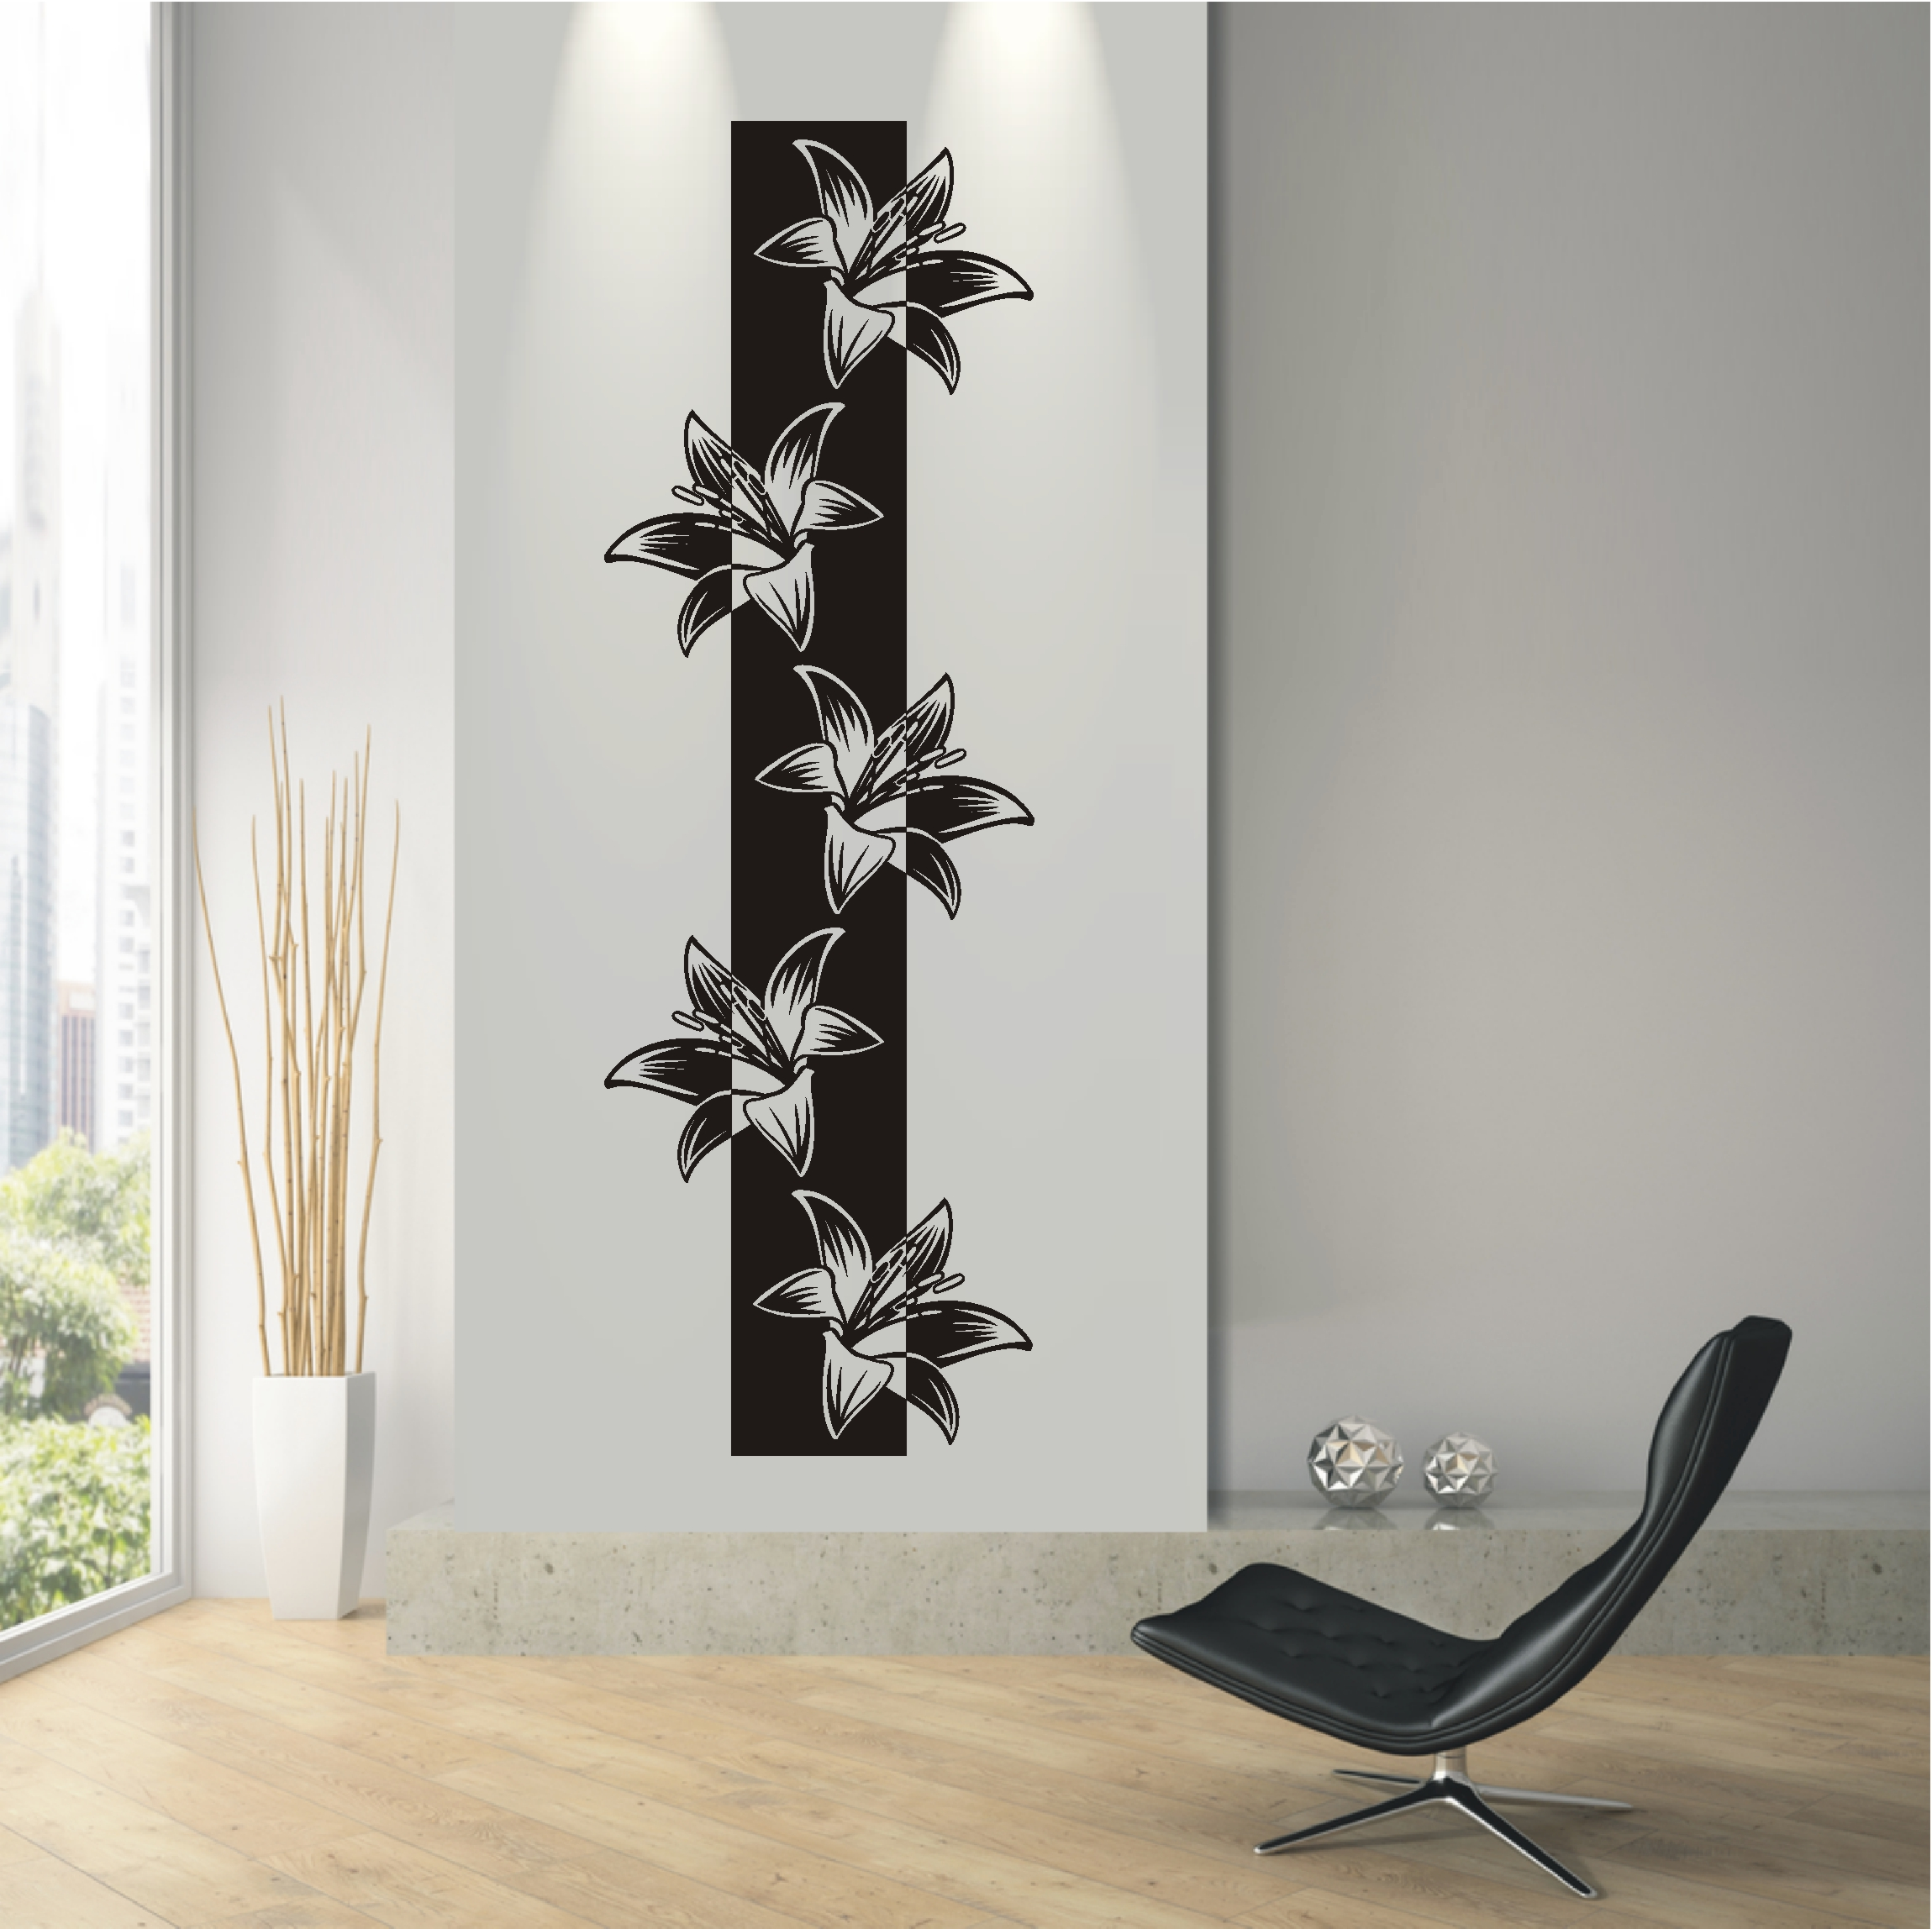 wandtattoo wandaufkleber blumen ranke banner bl ten. Black Bedroom Furniture Sets. Home Design Ideas